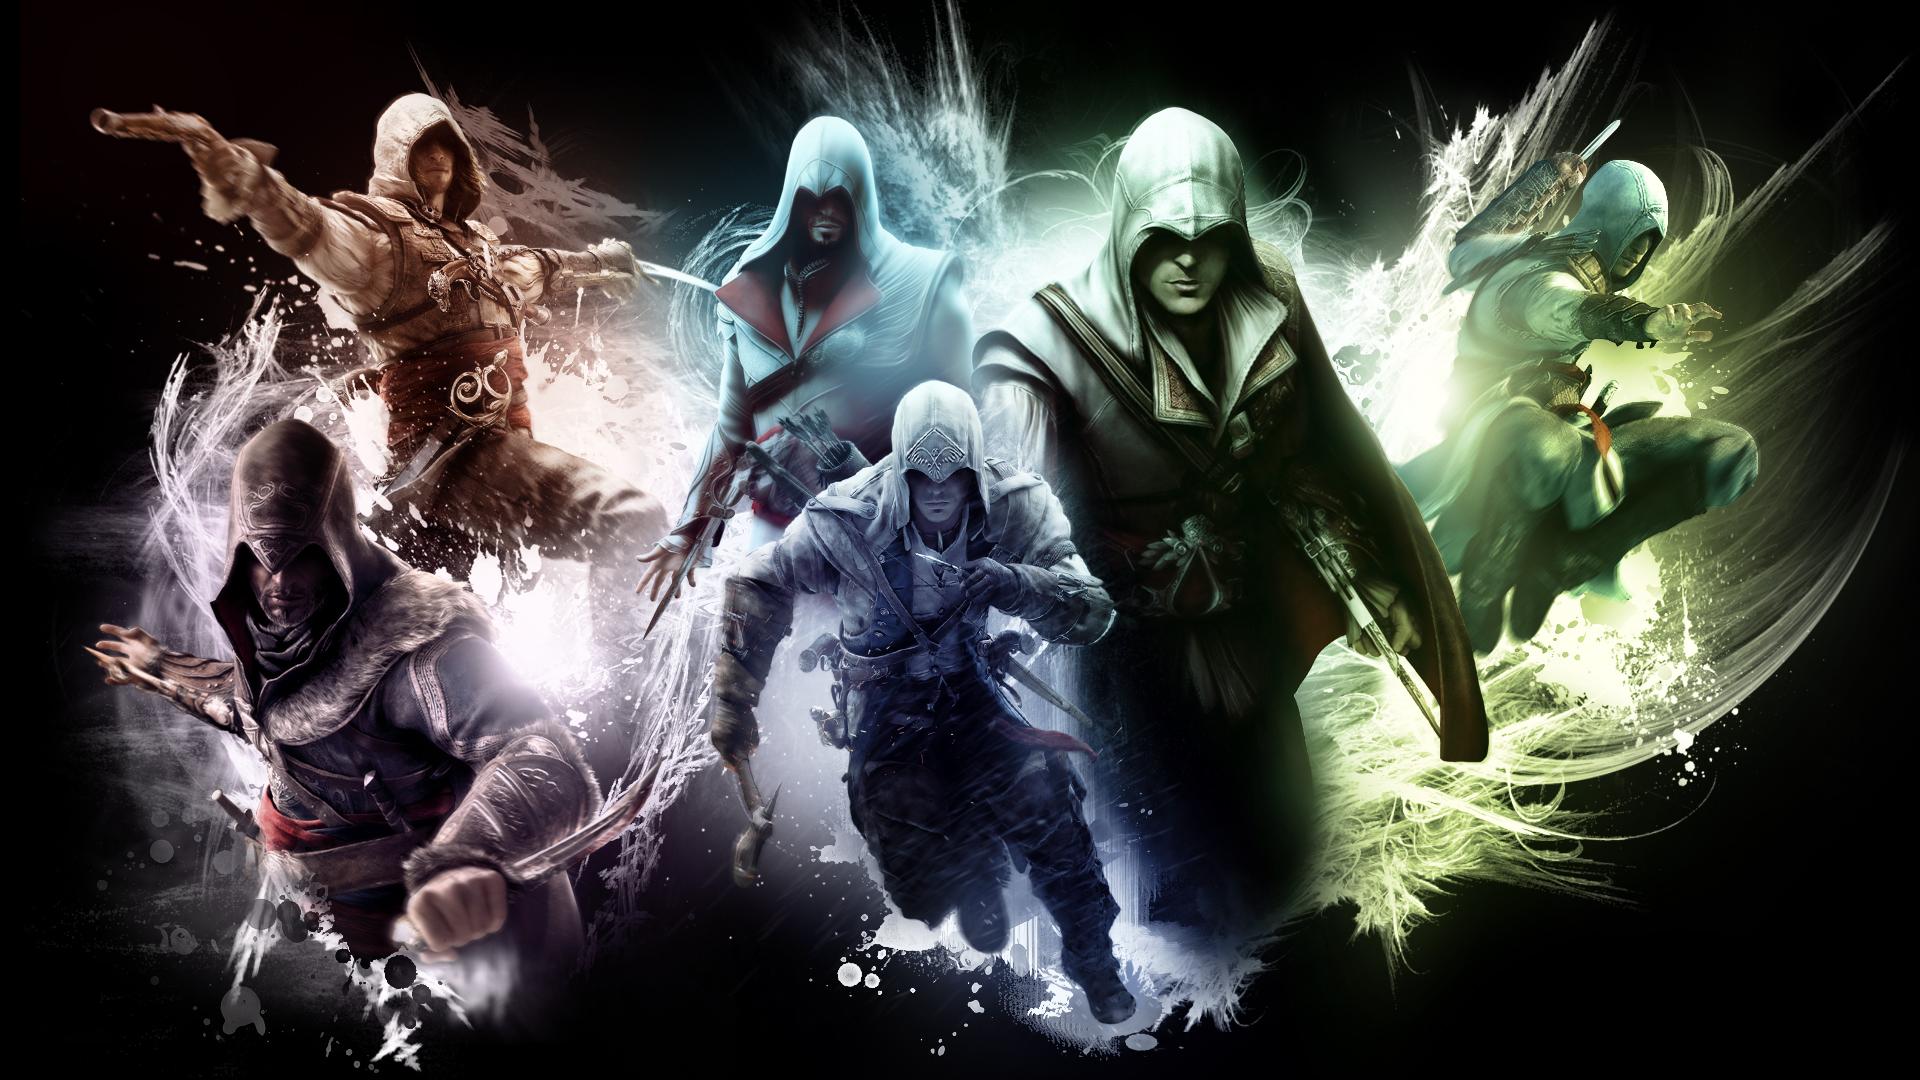 Adewale - Assassin'-s Creed IV - Black Flag Mobile Wallpaper 3282